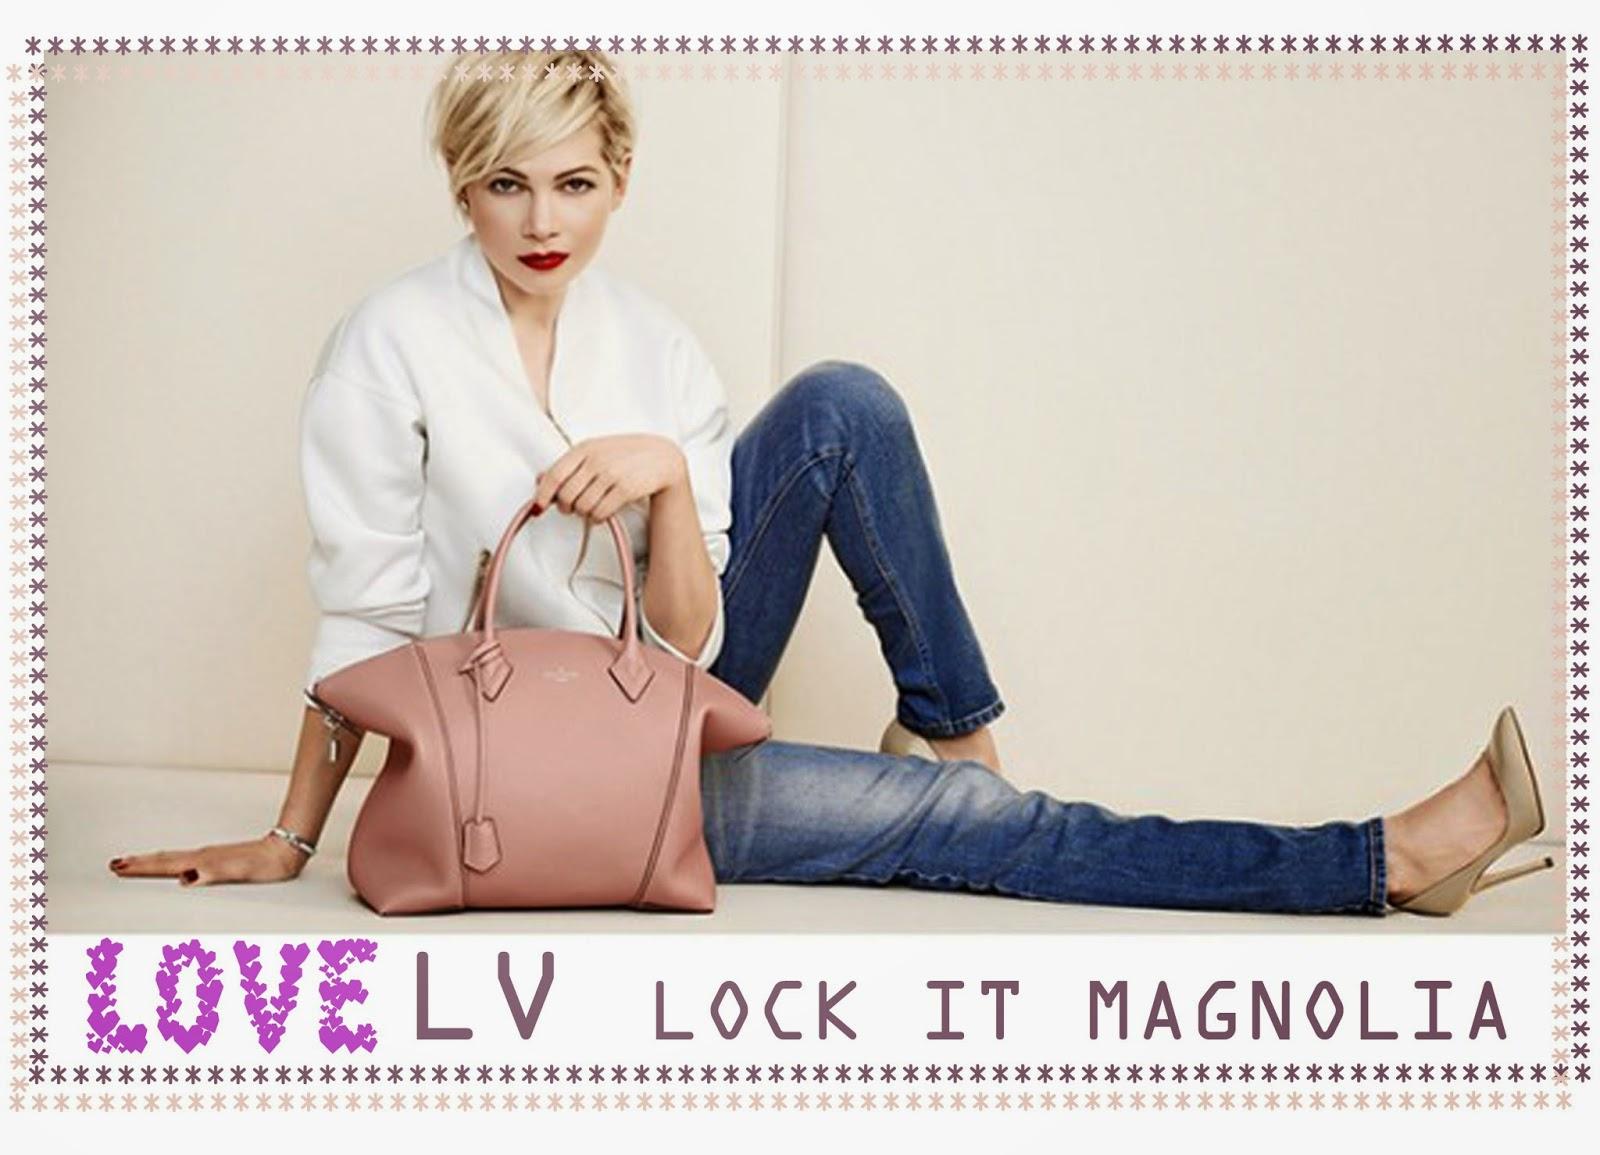 photo-lock_it_magnolia-louis_vuitton-bag-nude